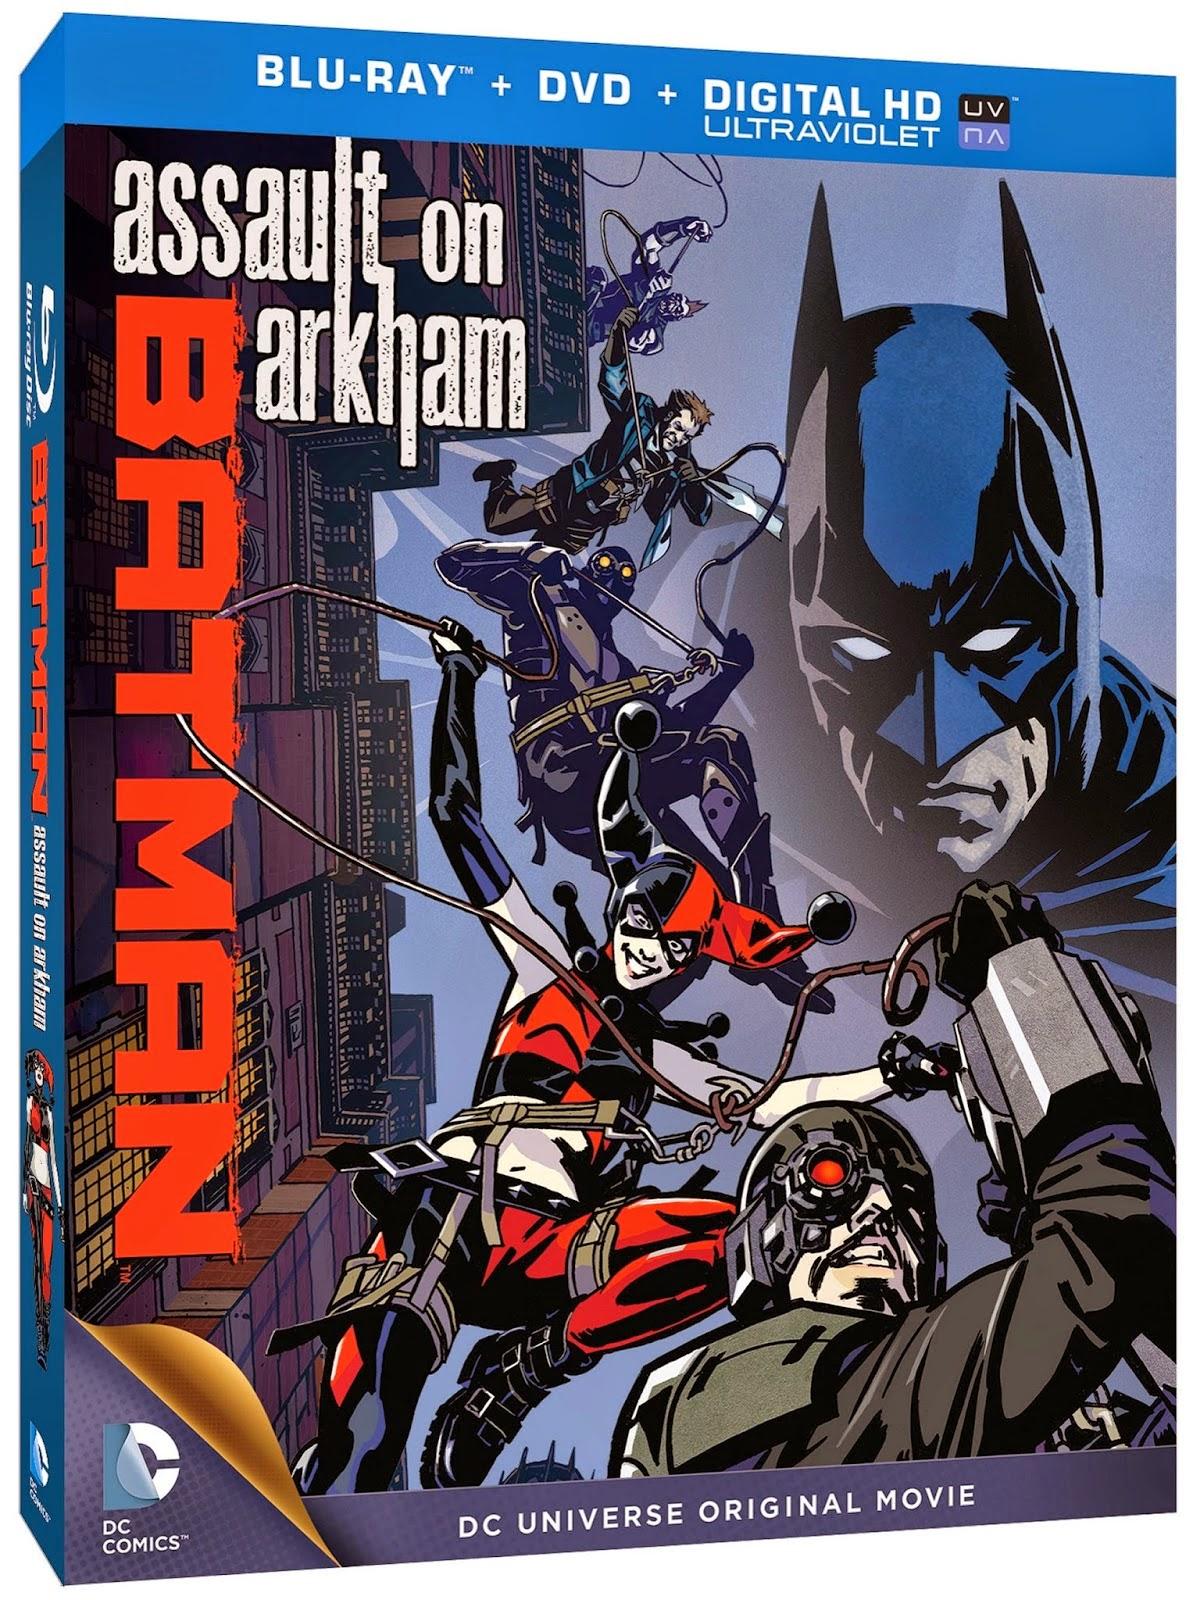 Batman Assault On Arkham (2014) 1080p BD25 1